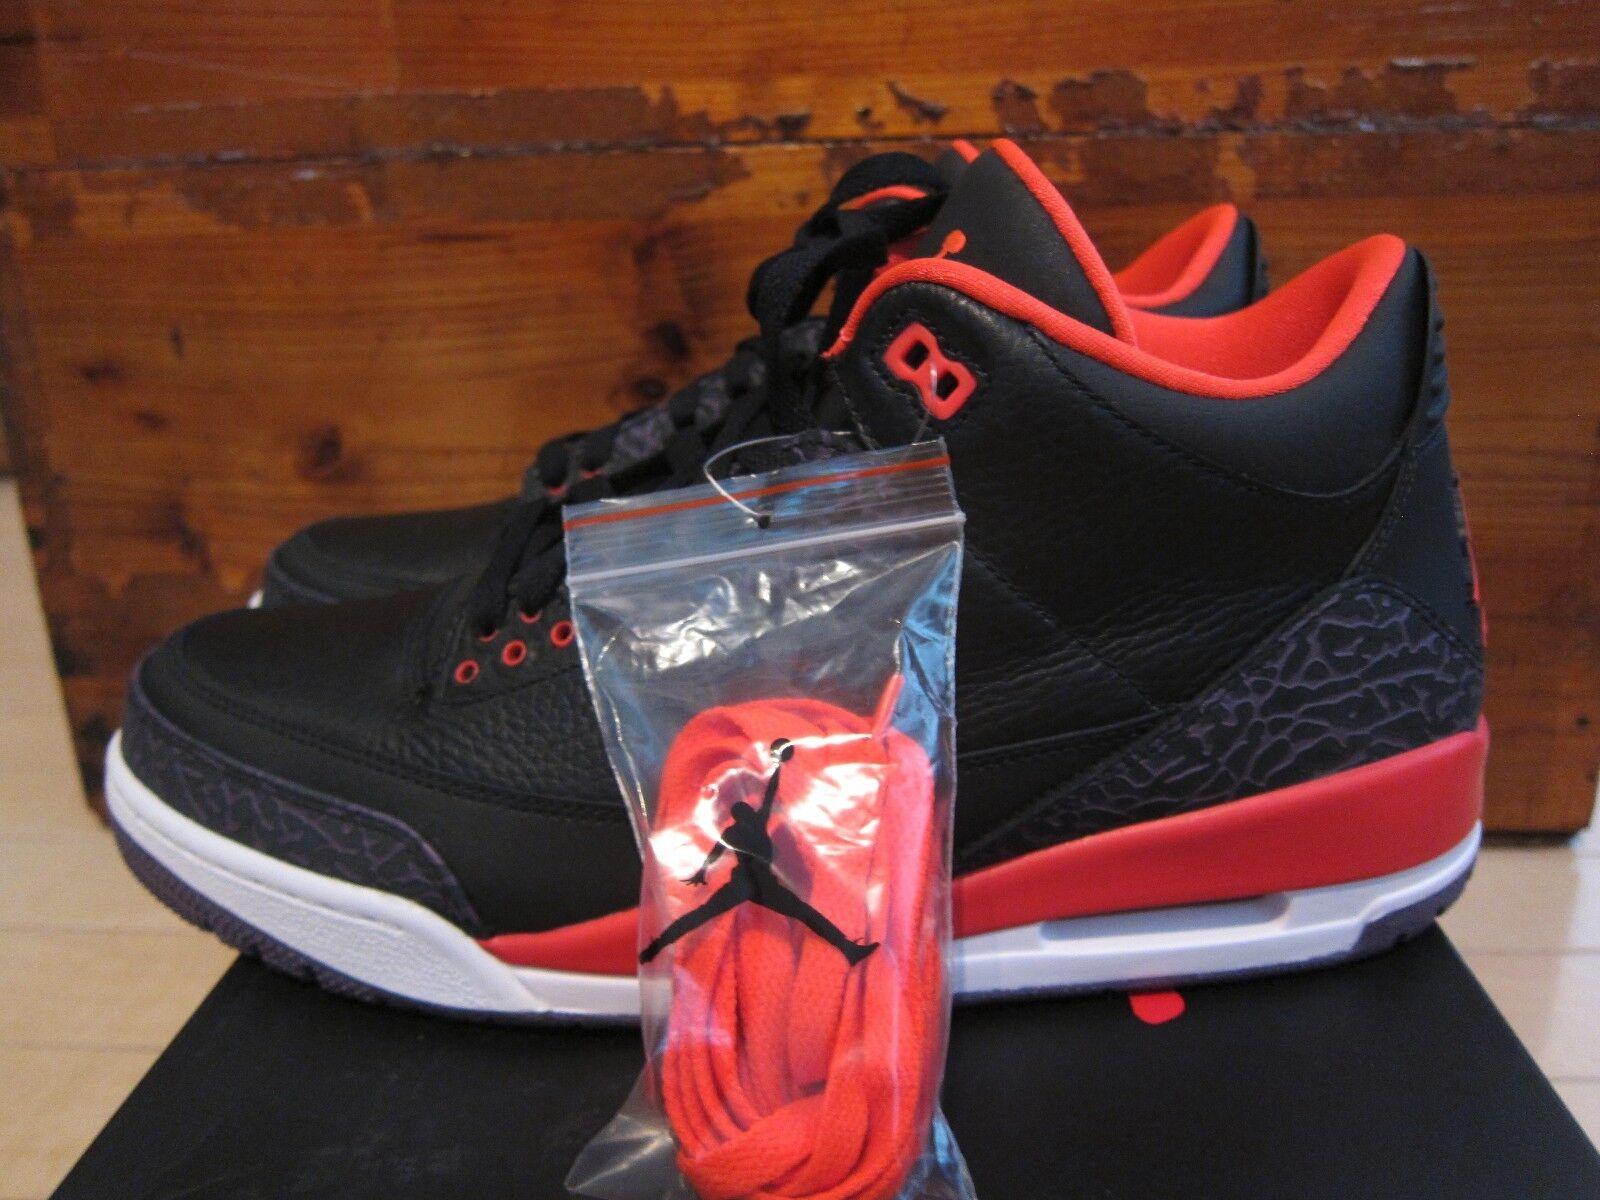 fa313c62f2c 2012 Nike Nike Nike Air Jordan 3 III Retro Crimson Black Purple size 12  899b31